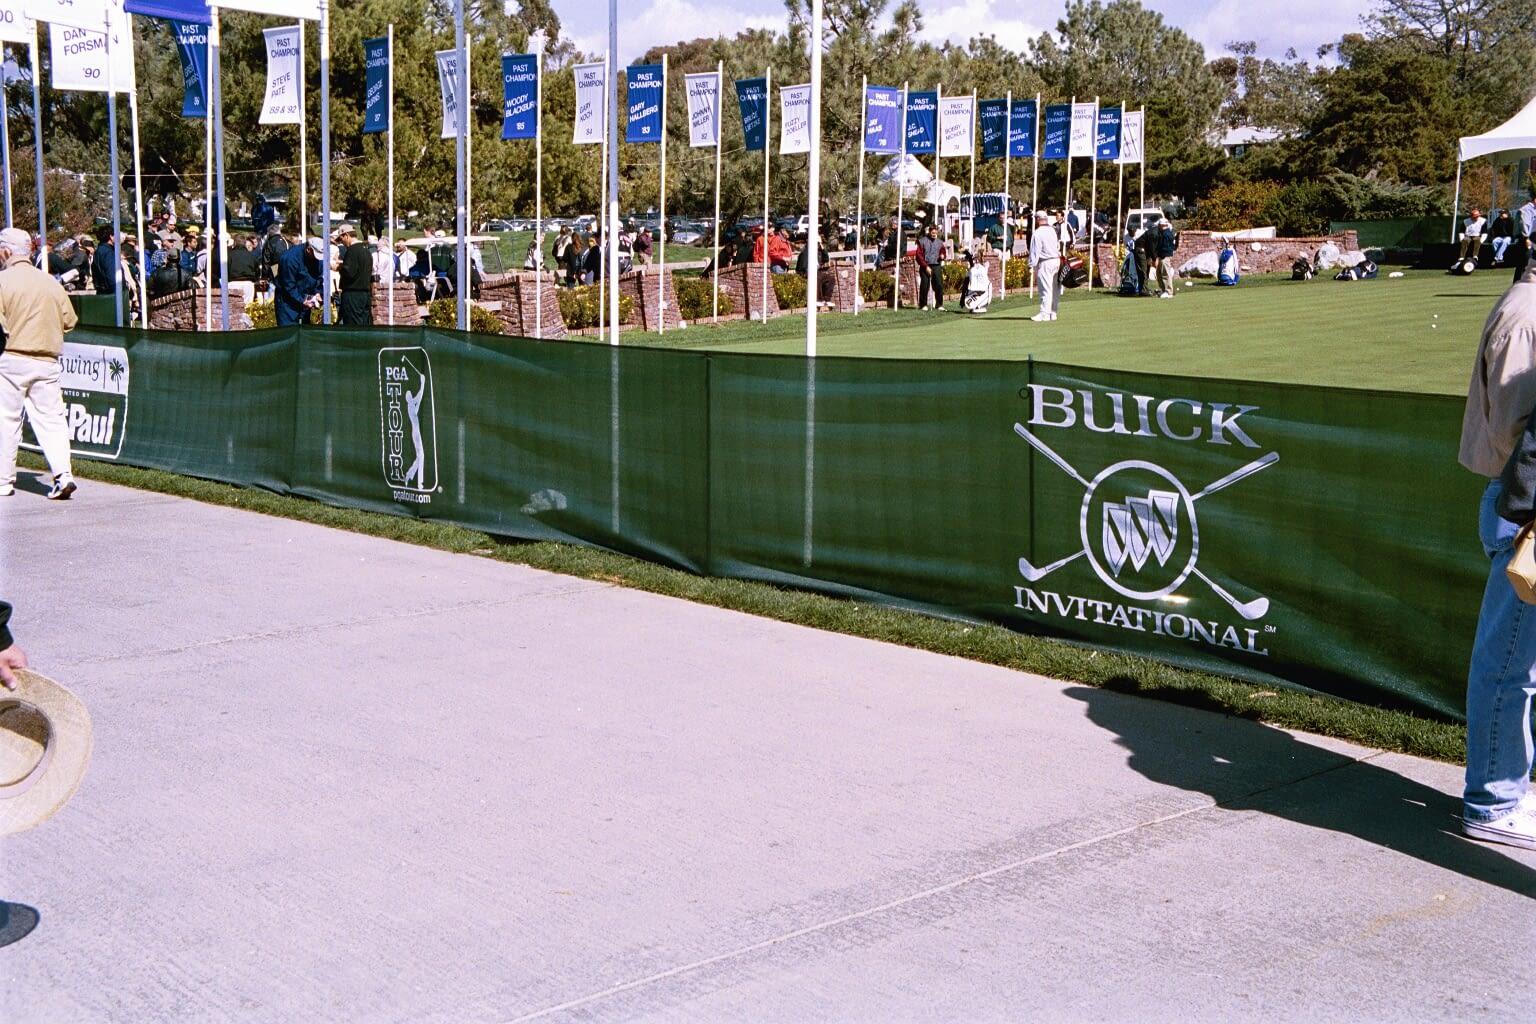 Buick 4th & Grape Image 1 (5)